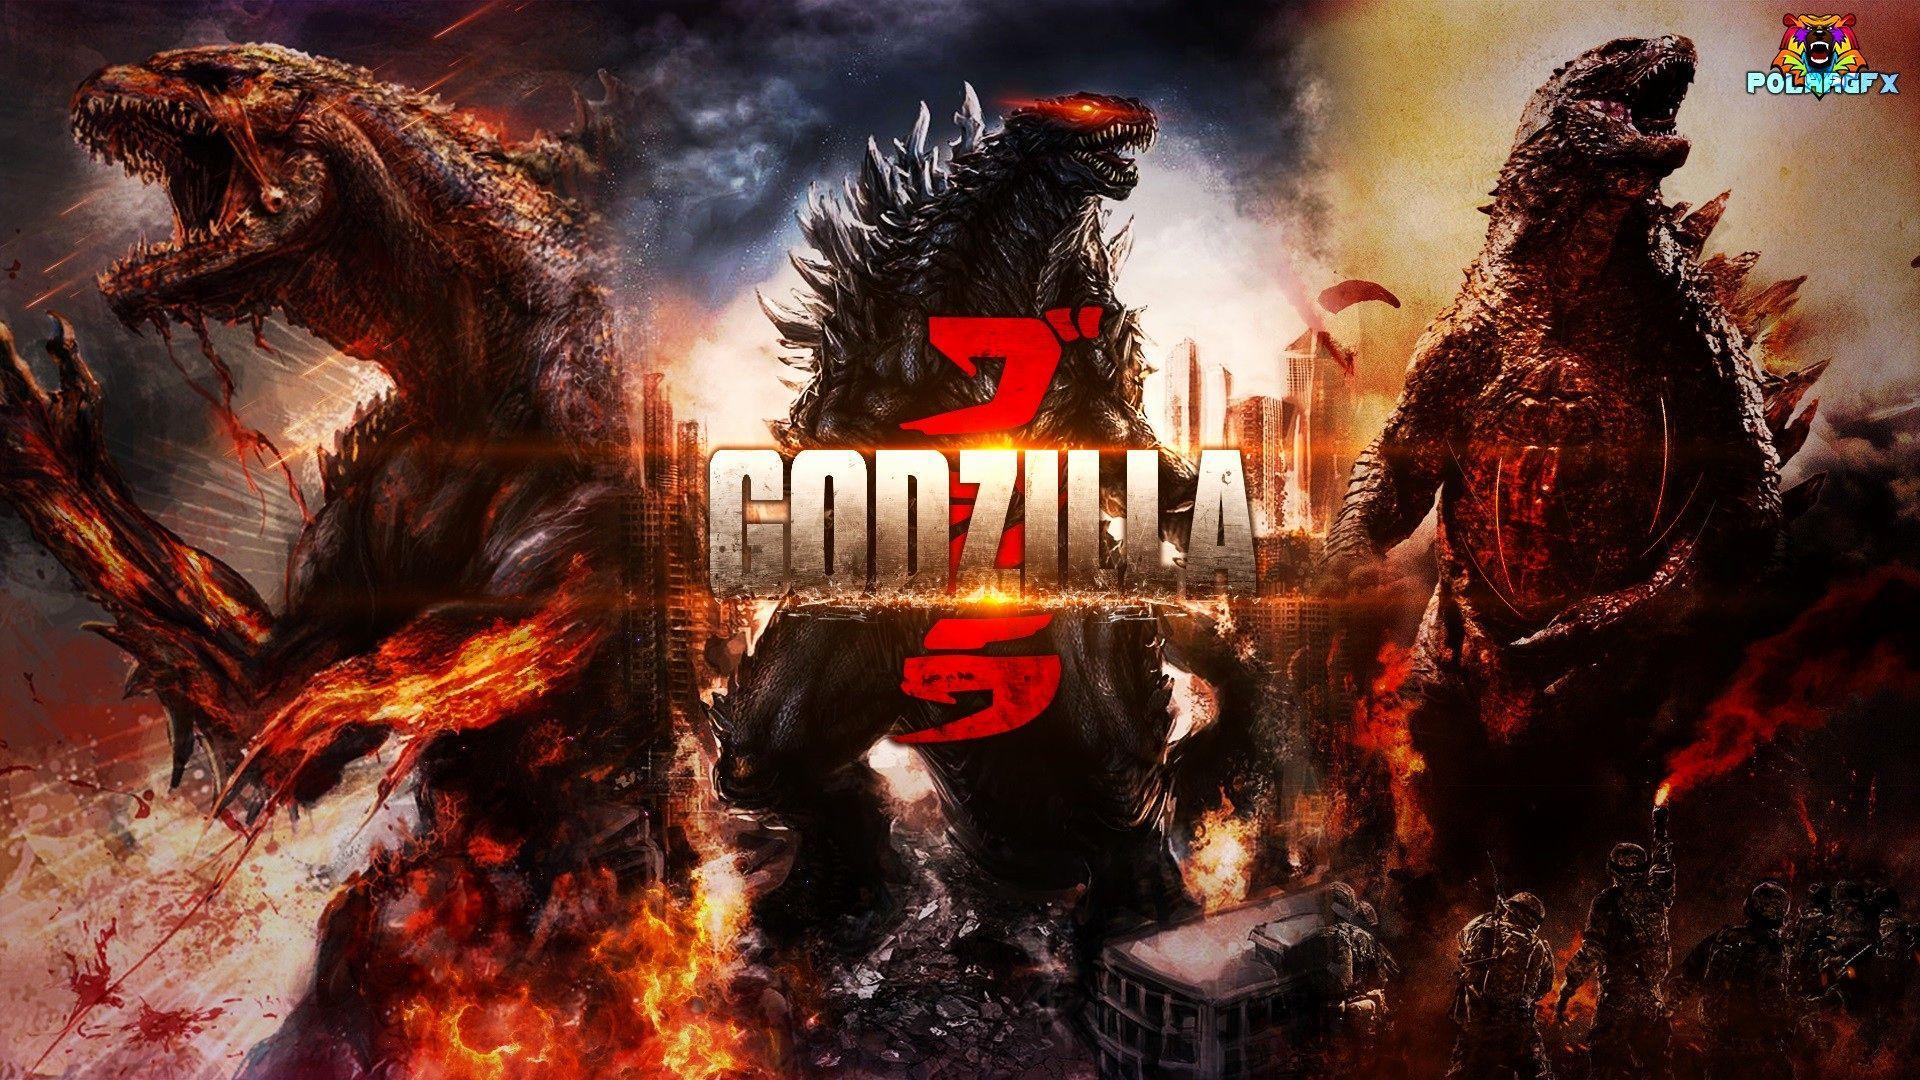 1920x1080 Godzilla hình nền Fresh Godzilla hình nền 72